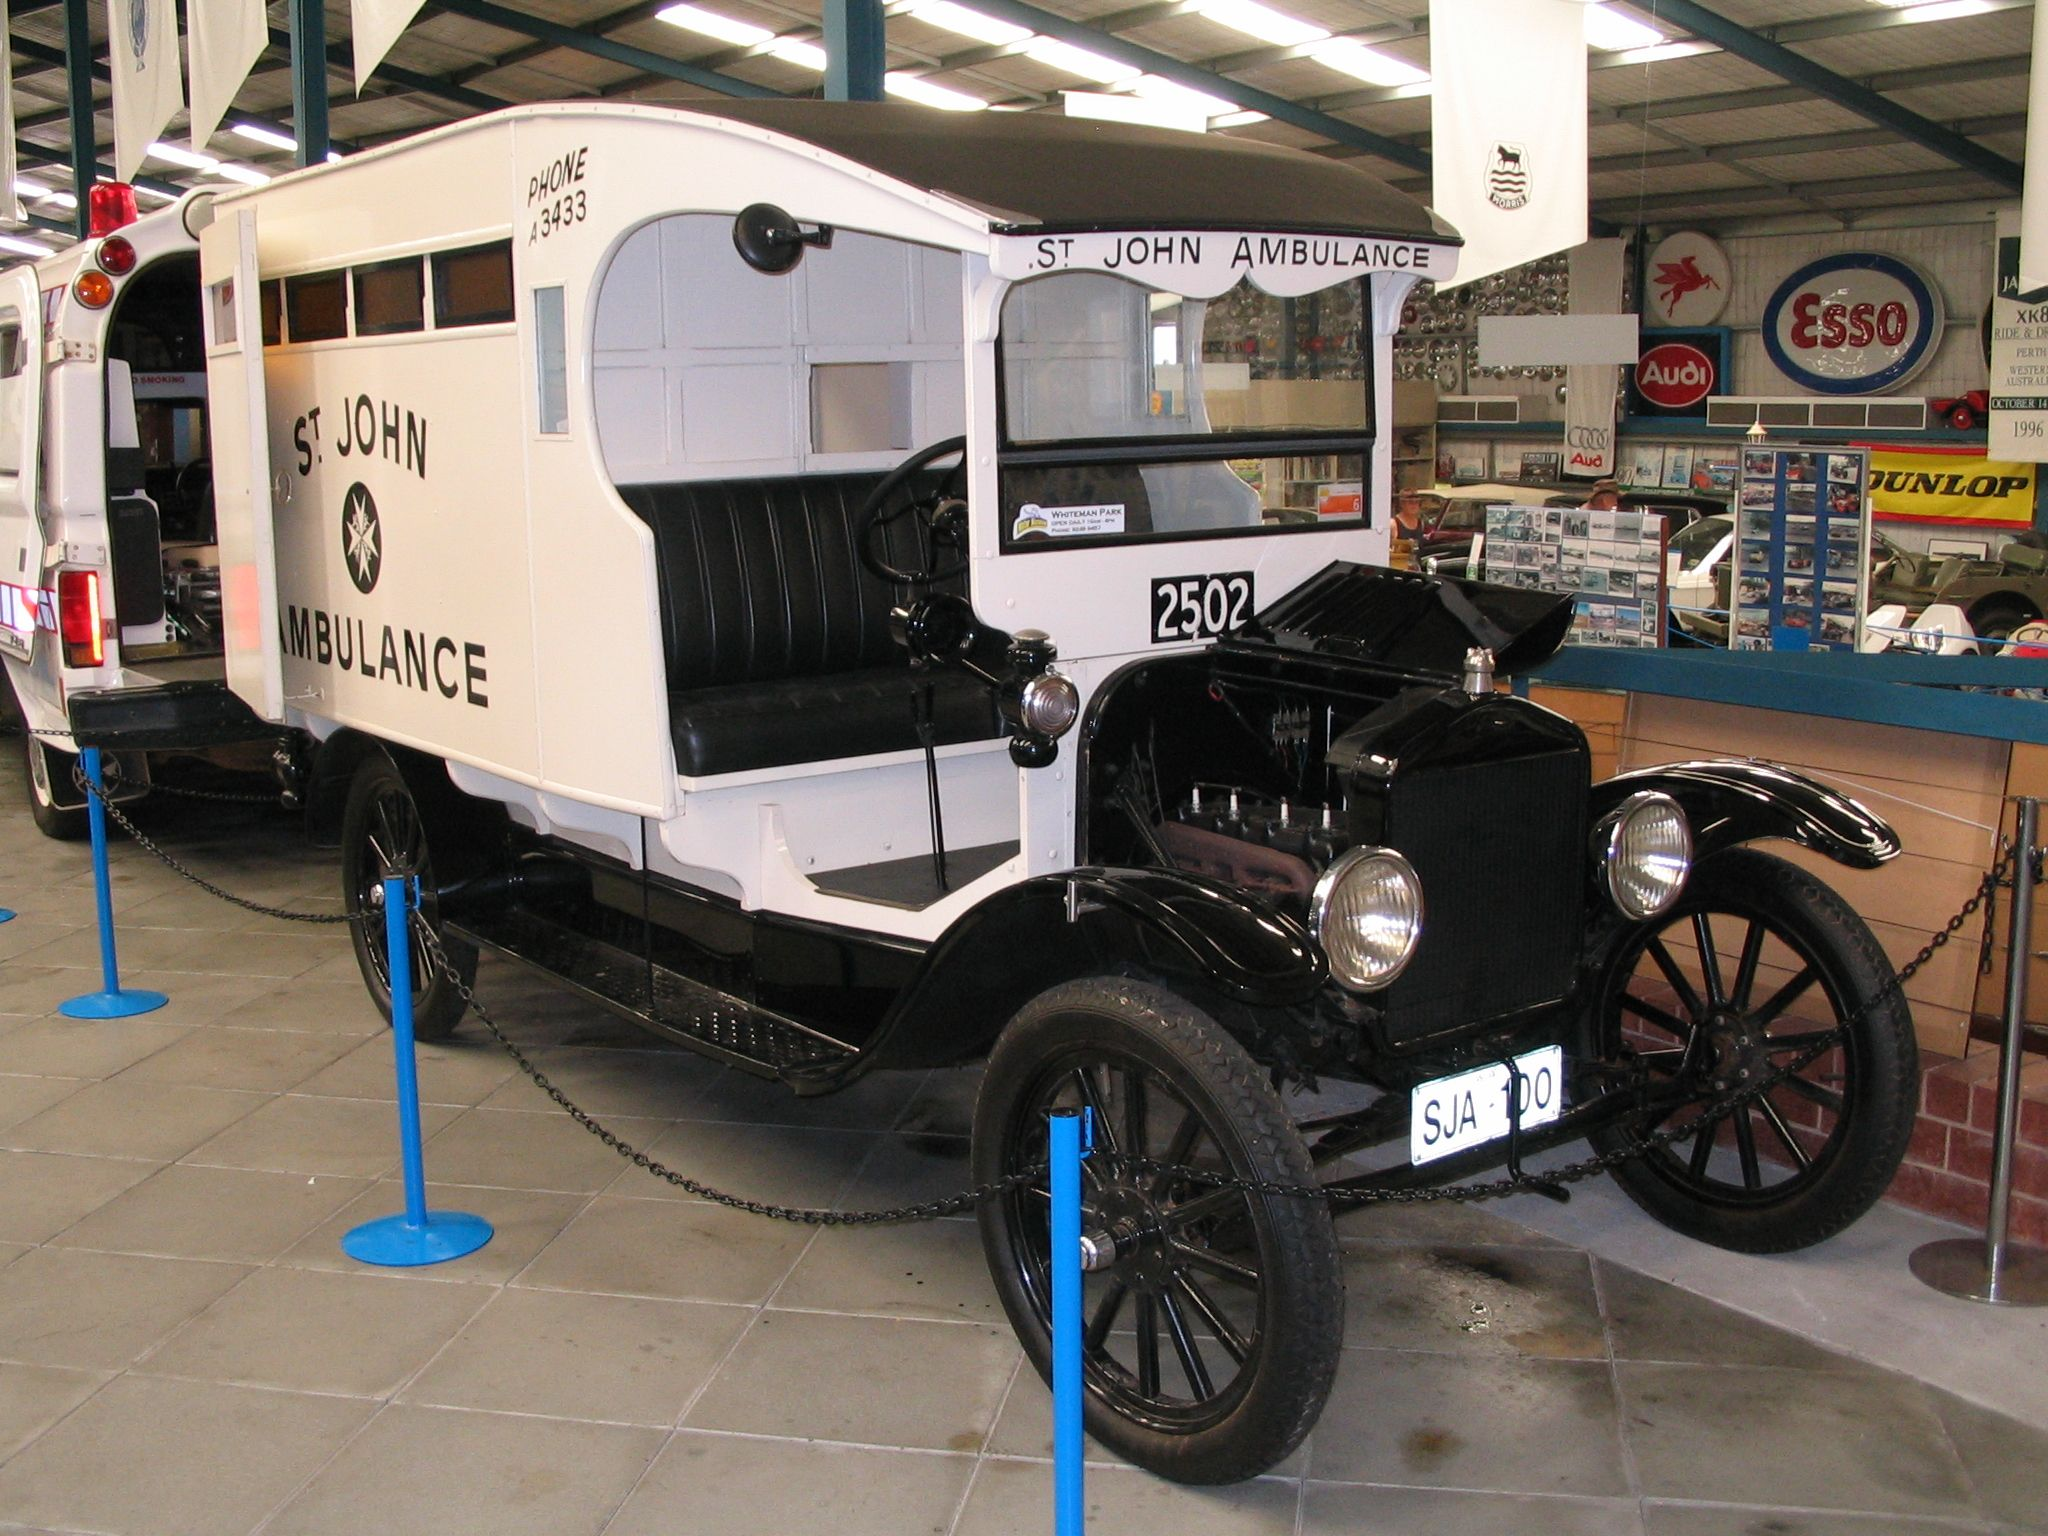 St John Ambulance. Perth, Western Australia | St John Ambulance ...